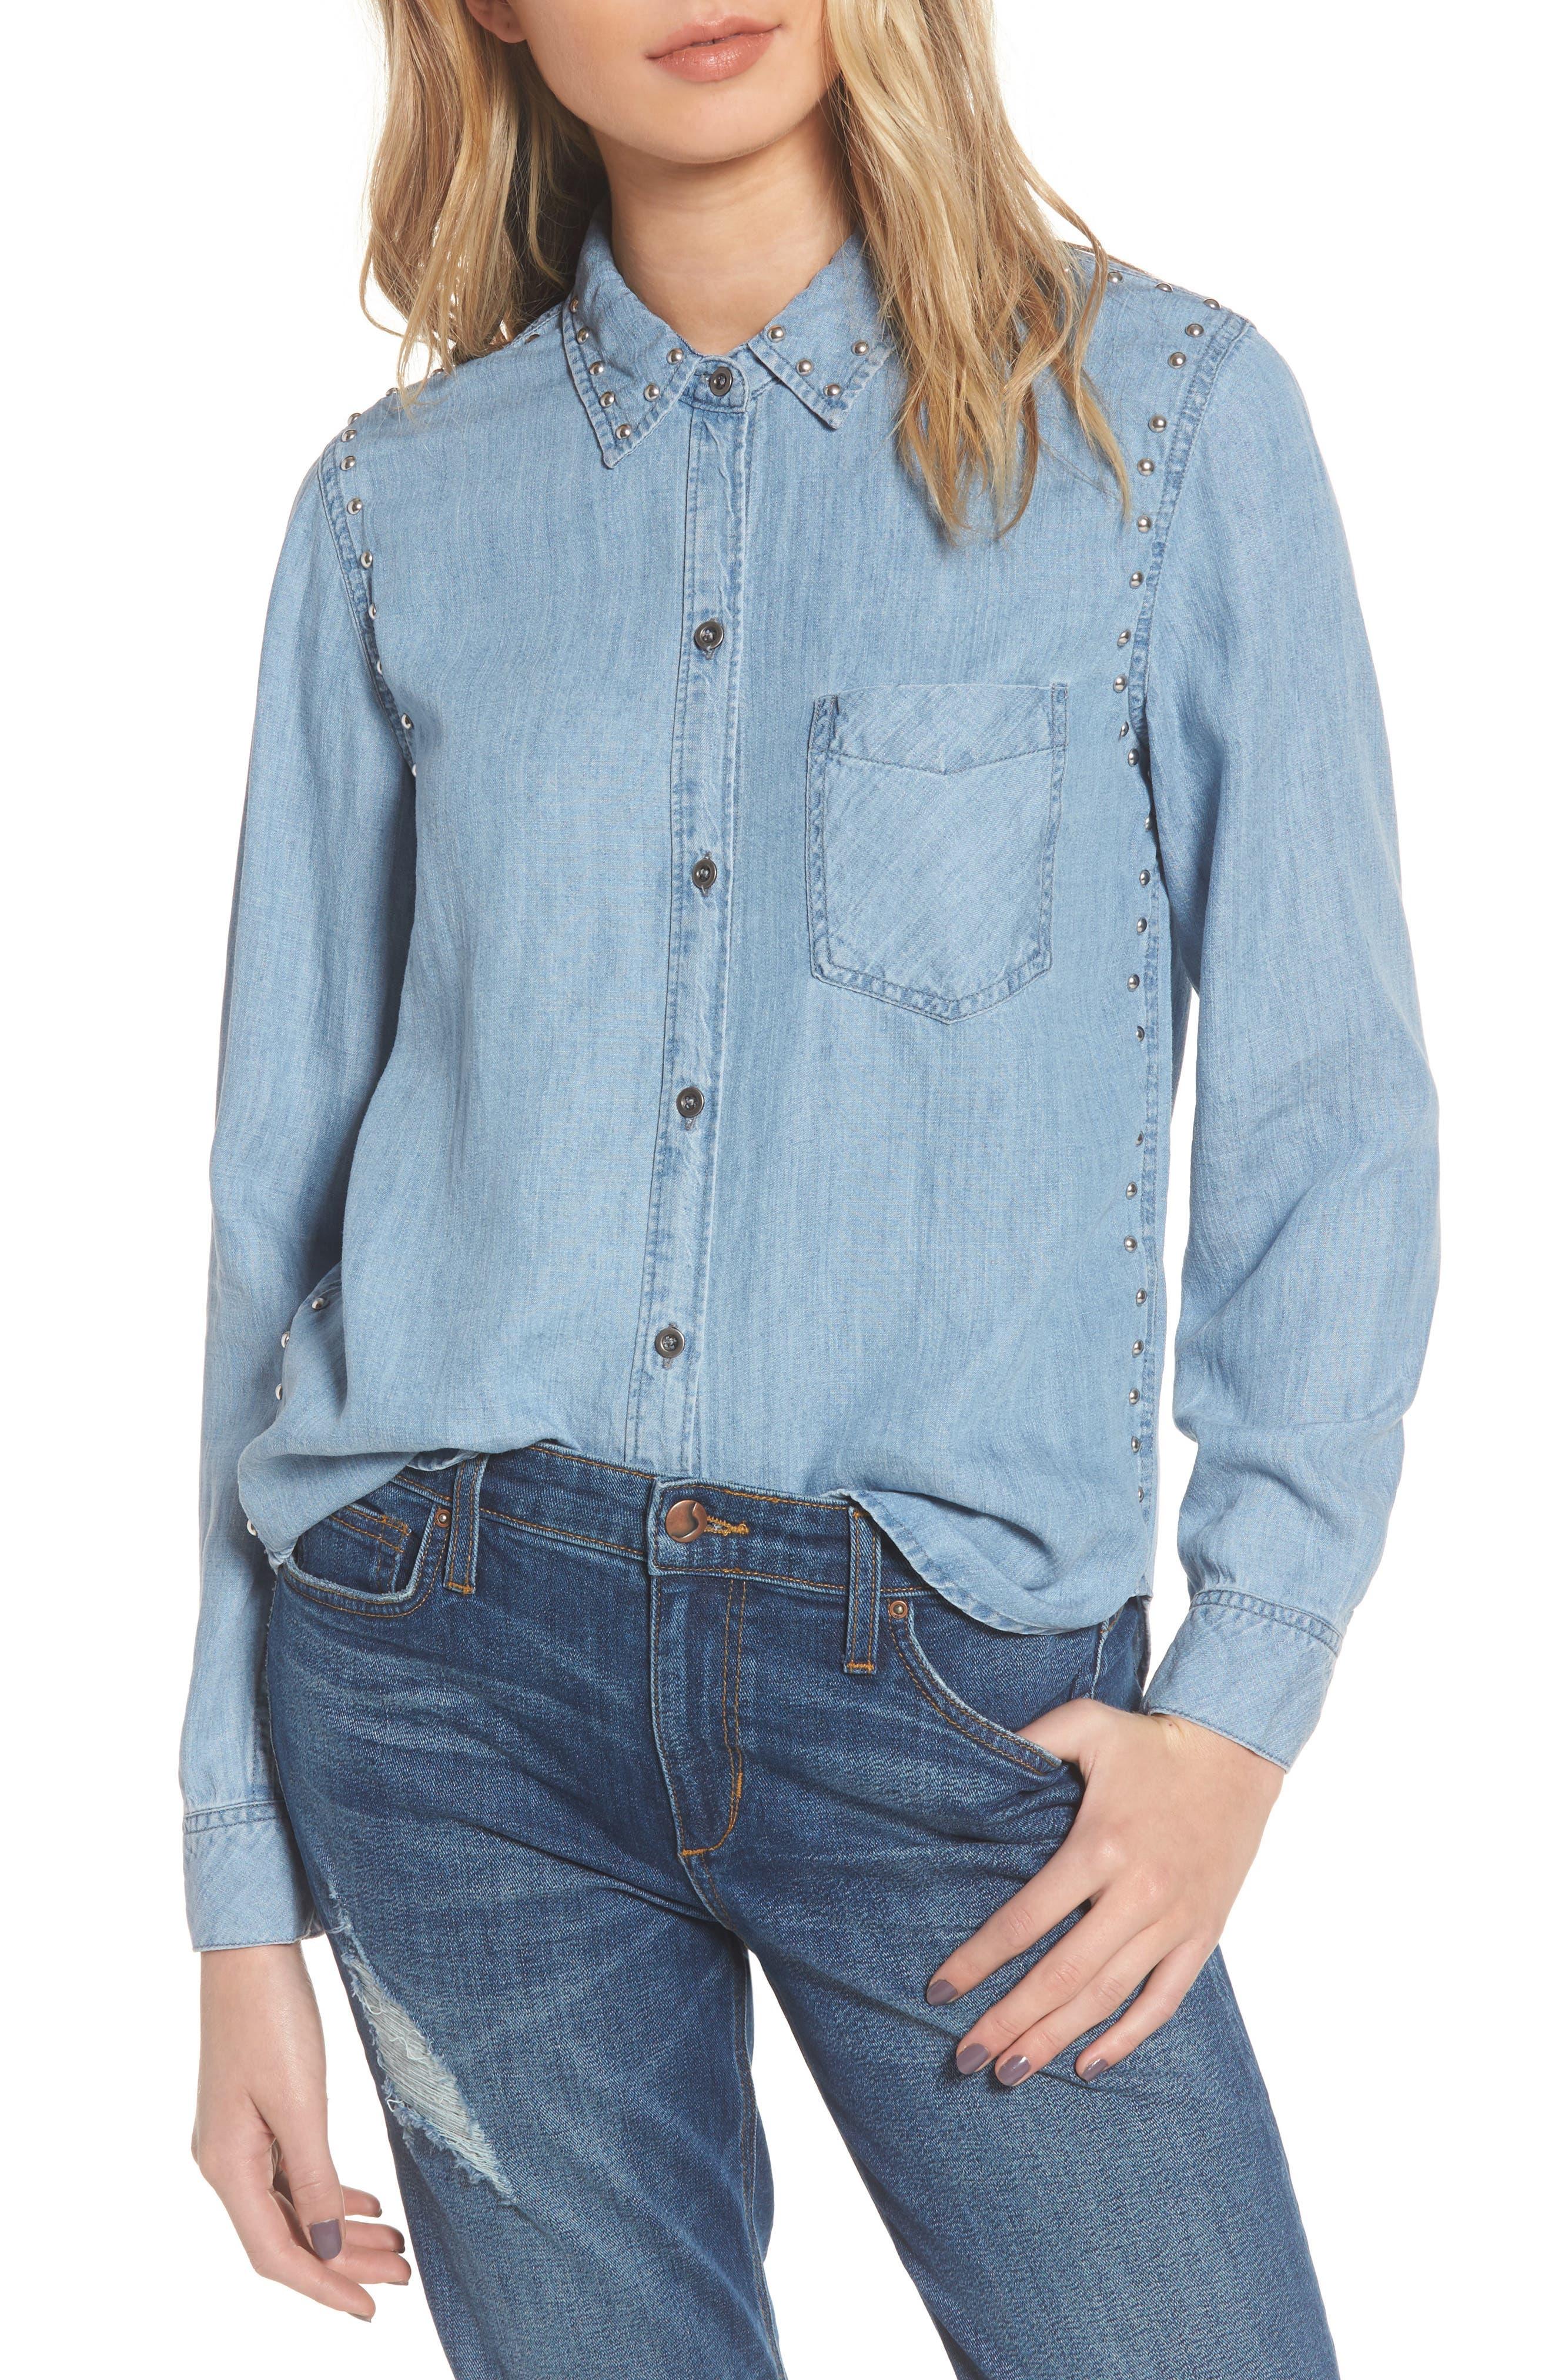 Alternate Image 1 Selected - Rails Ingrid Studded Shirt